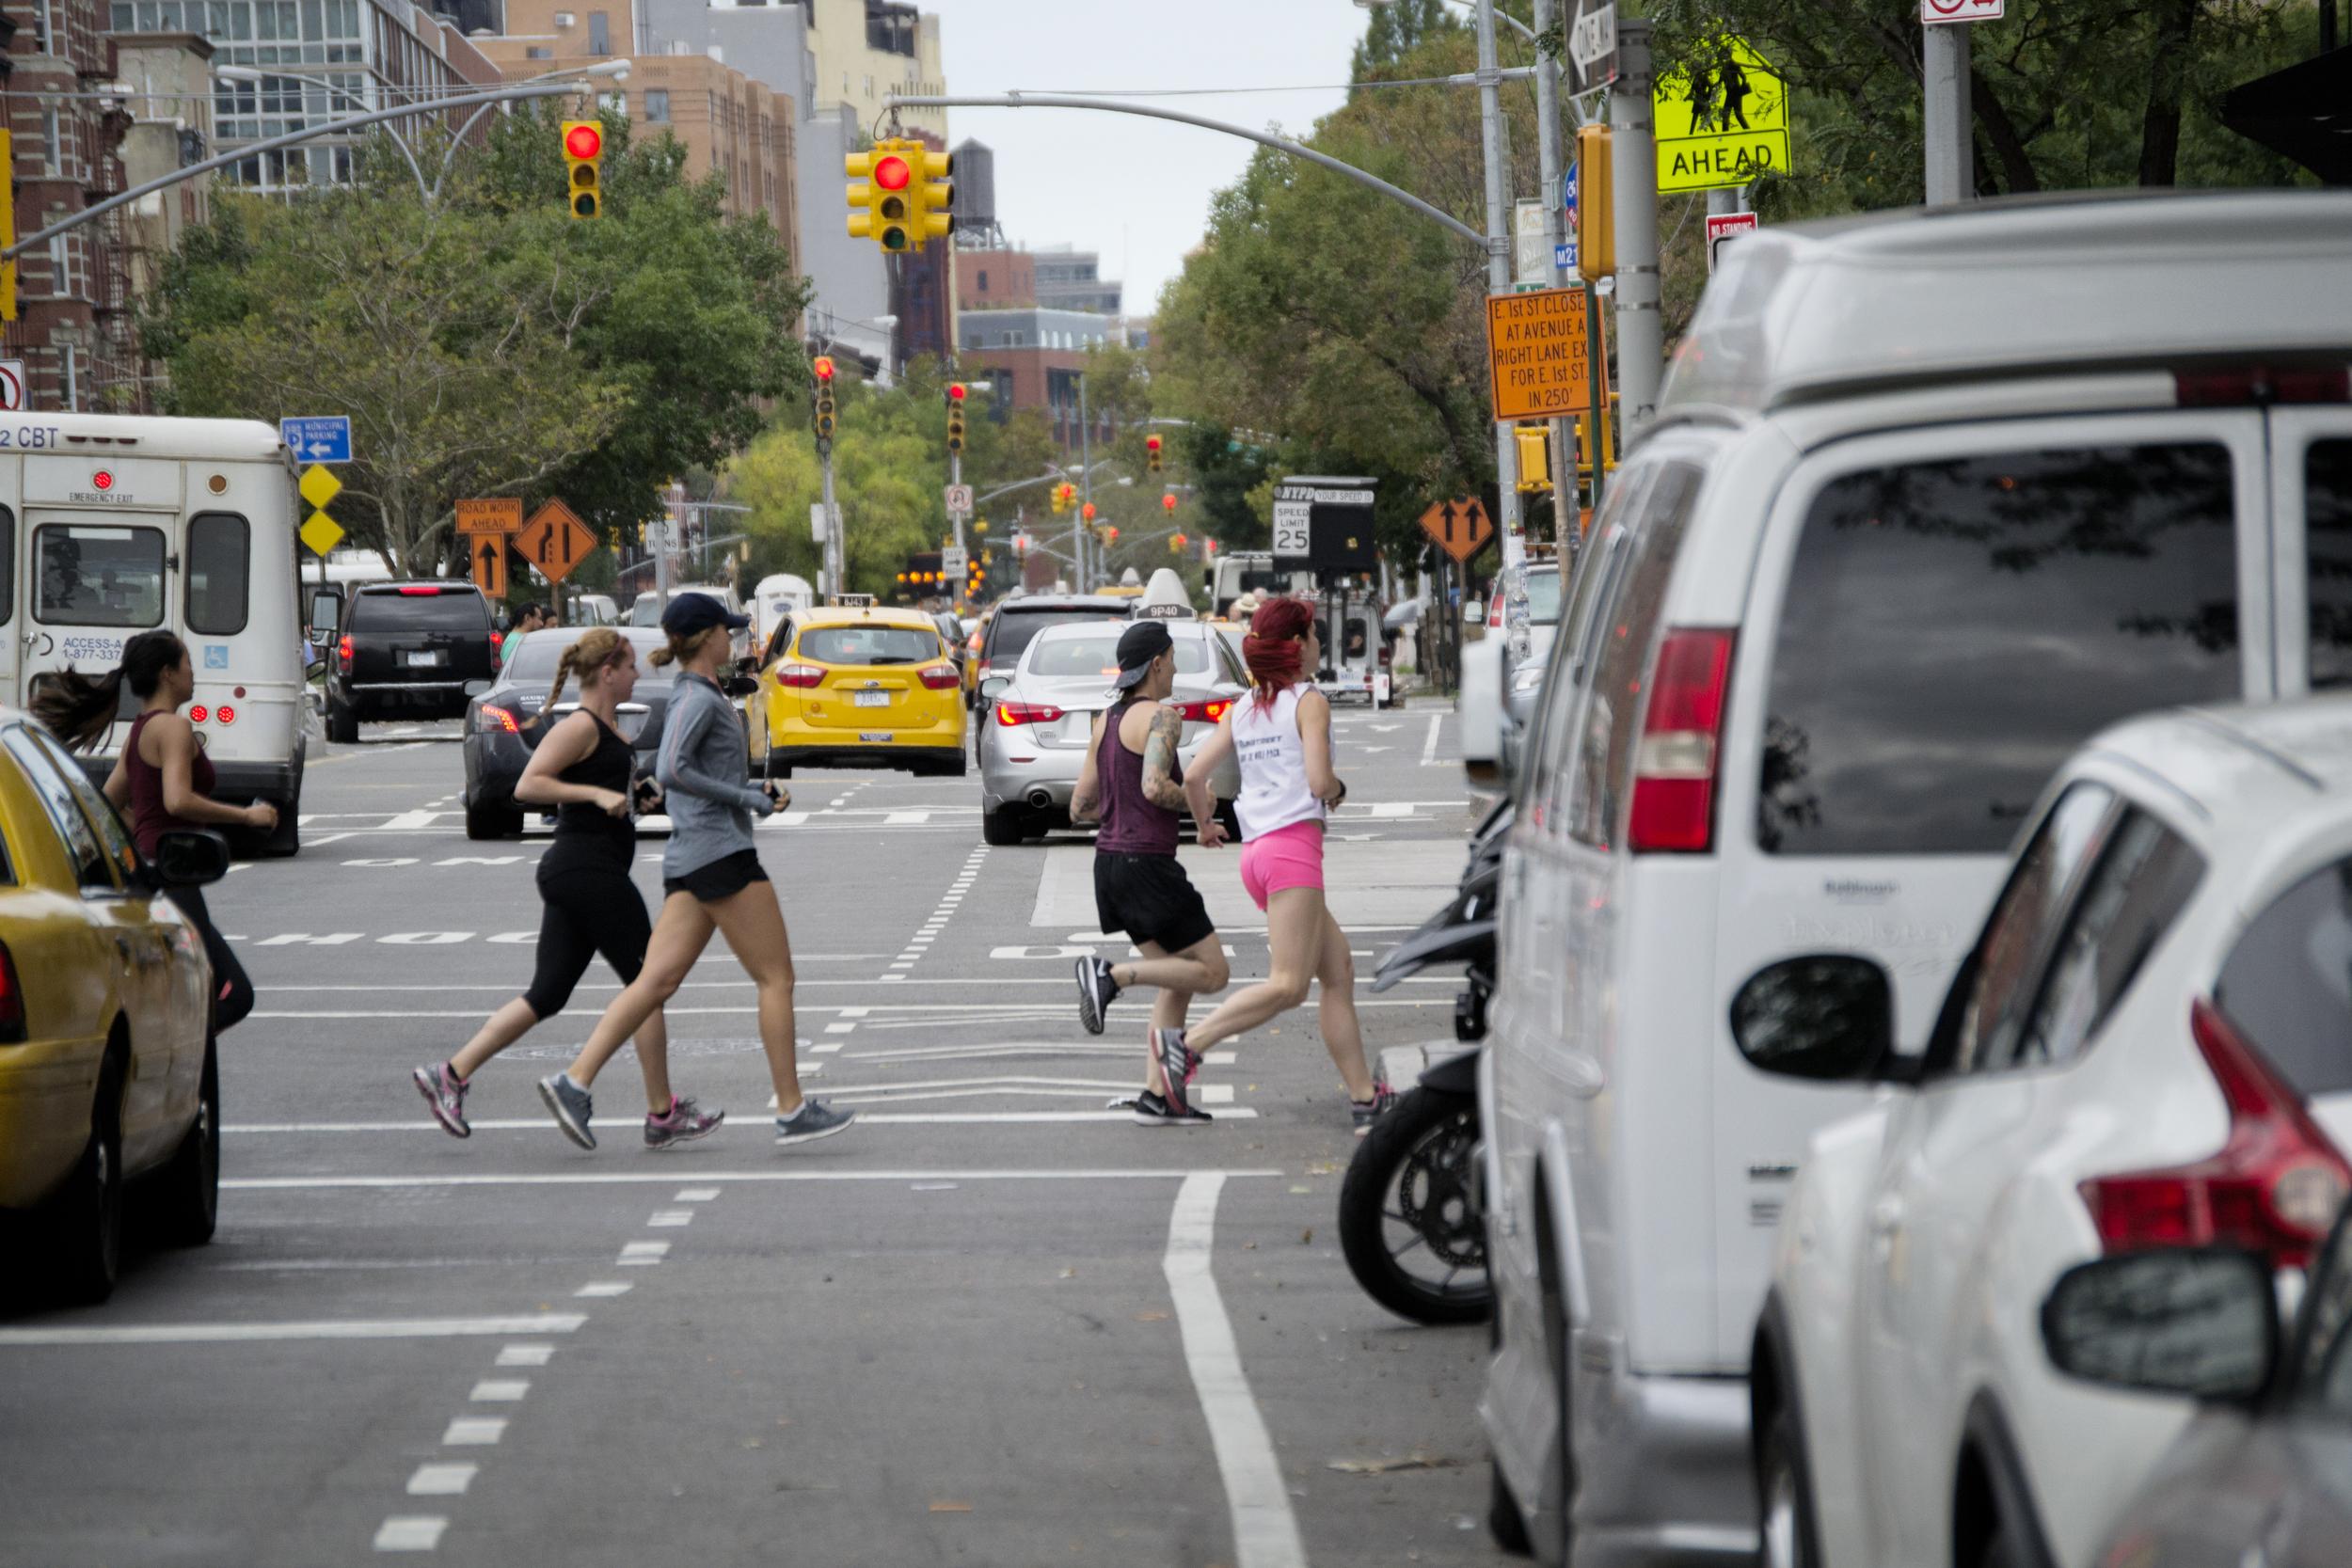 runners-nyc-runstreet-street-art-run